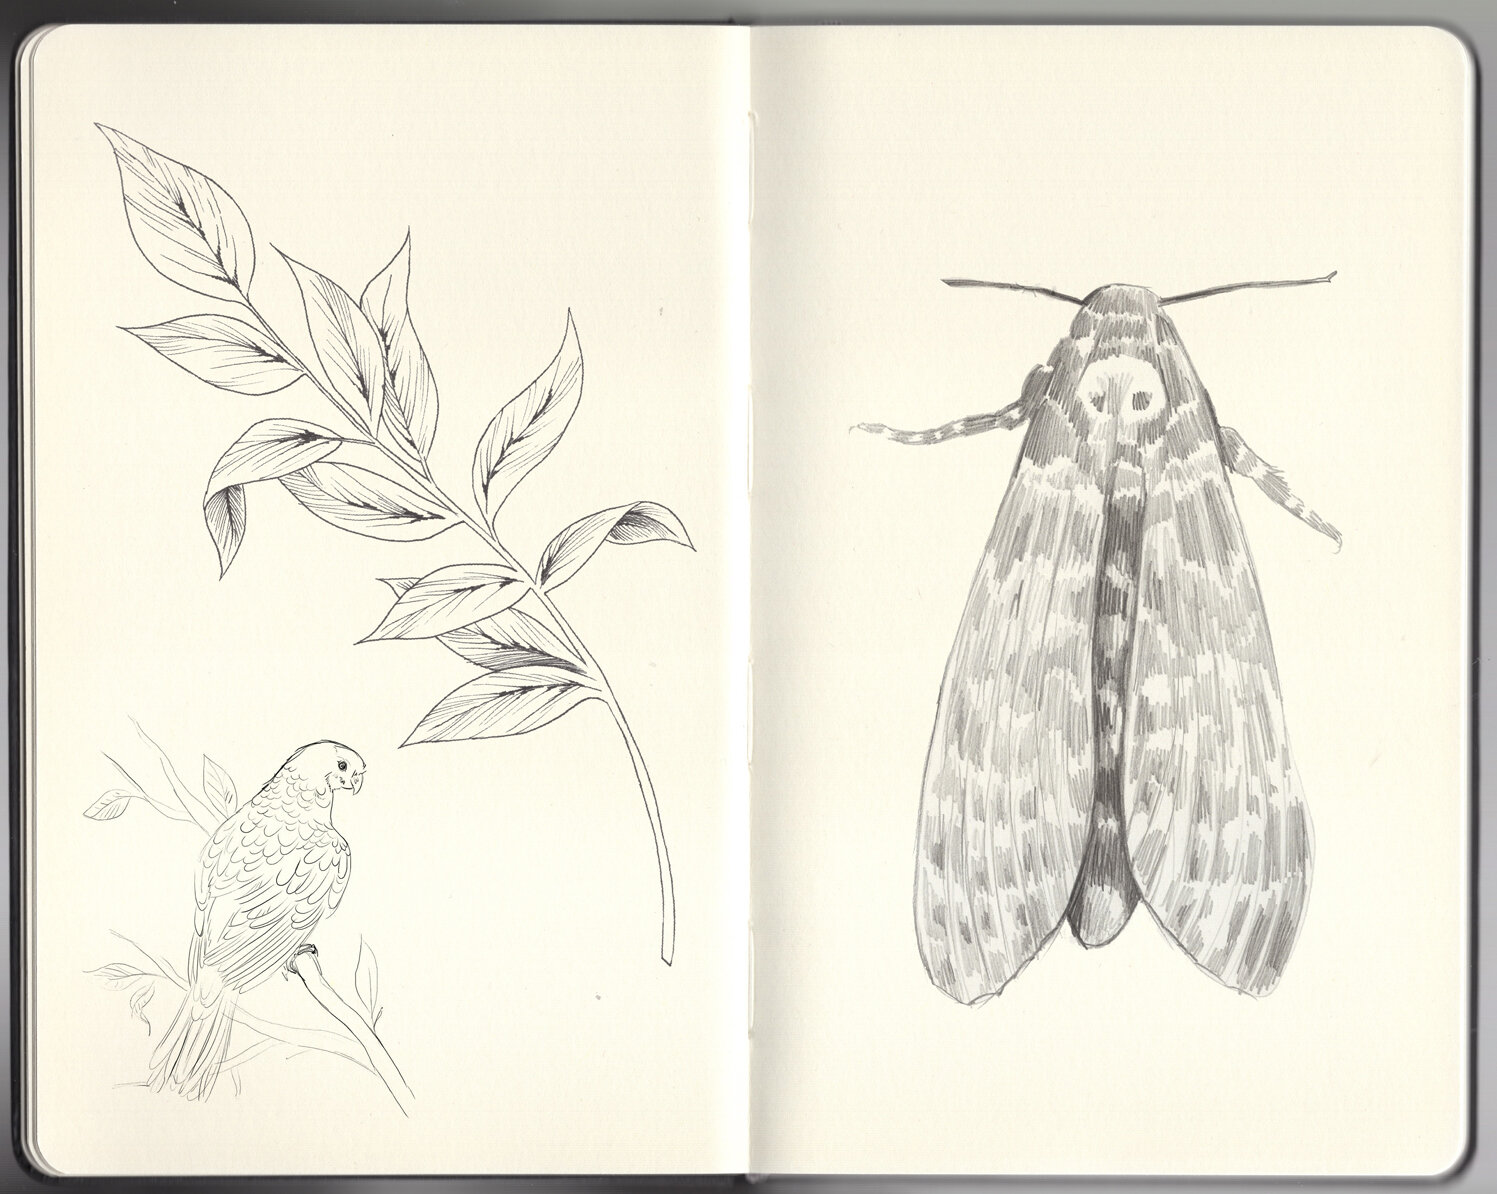 LASC_Personal_Sketchbook_2019_01_Pagina_15.jpg